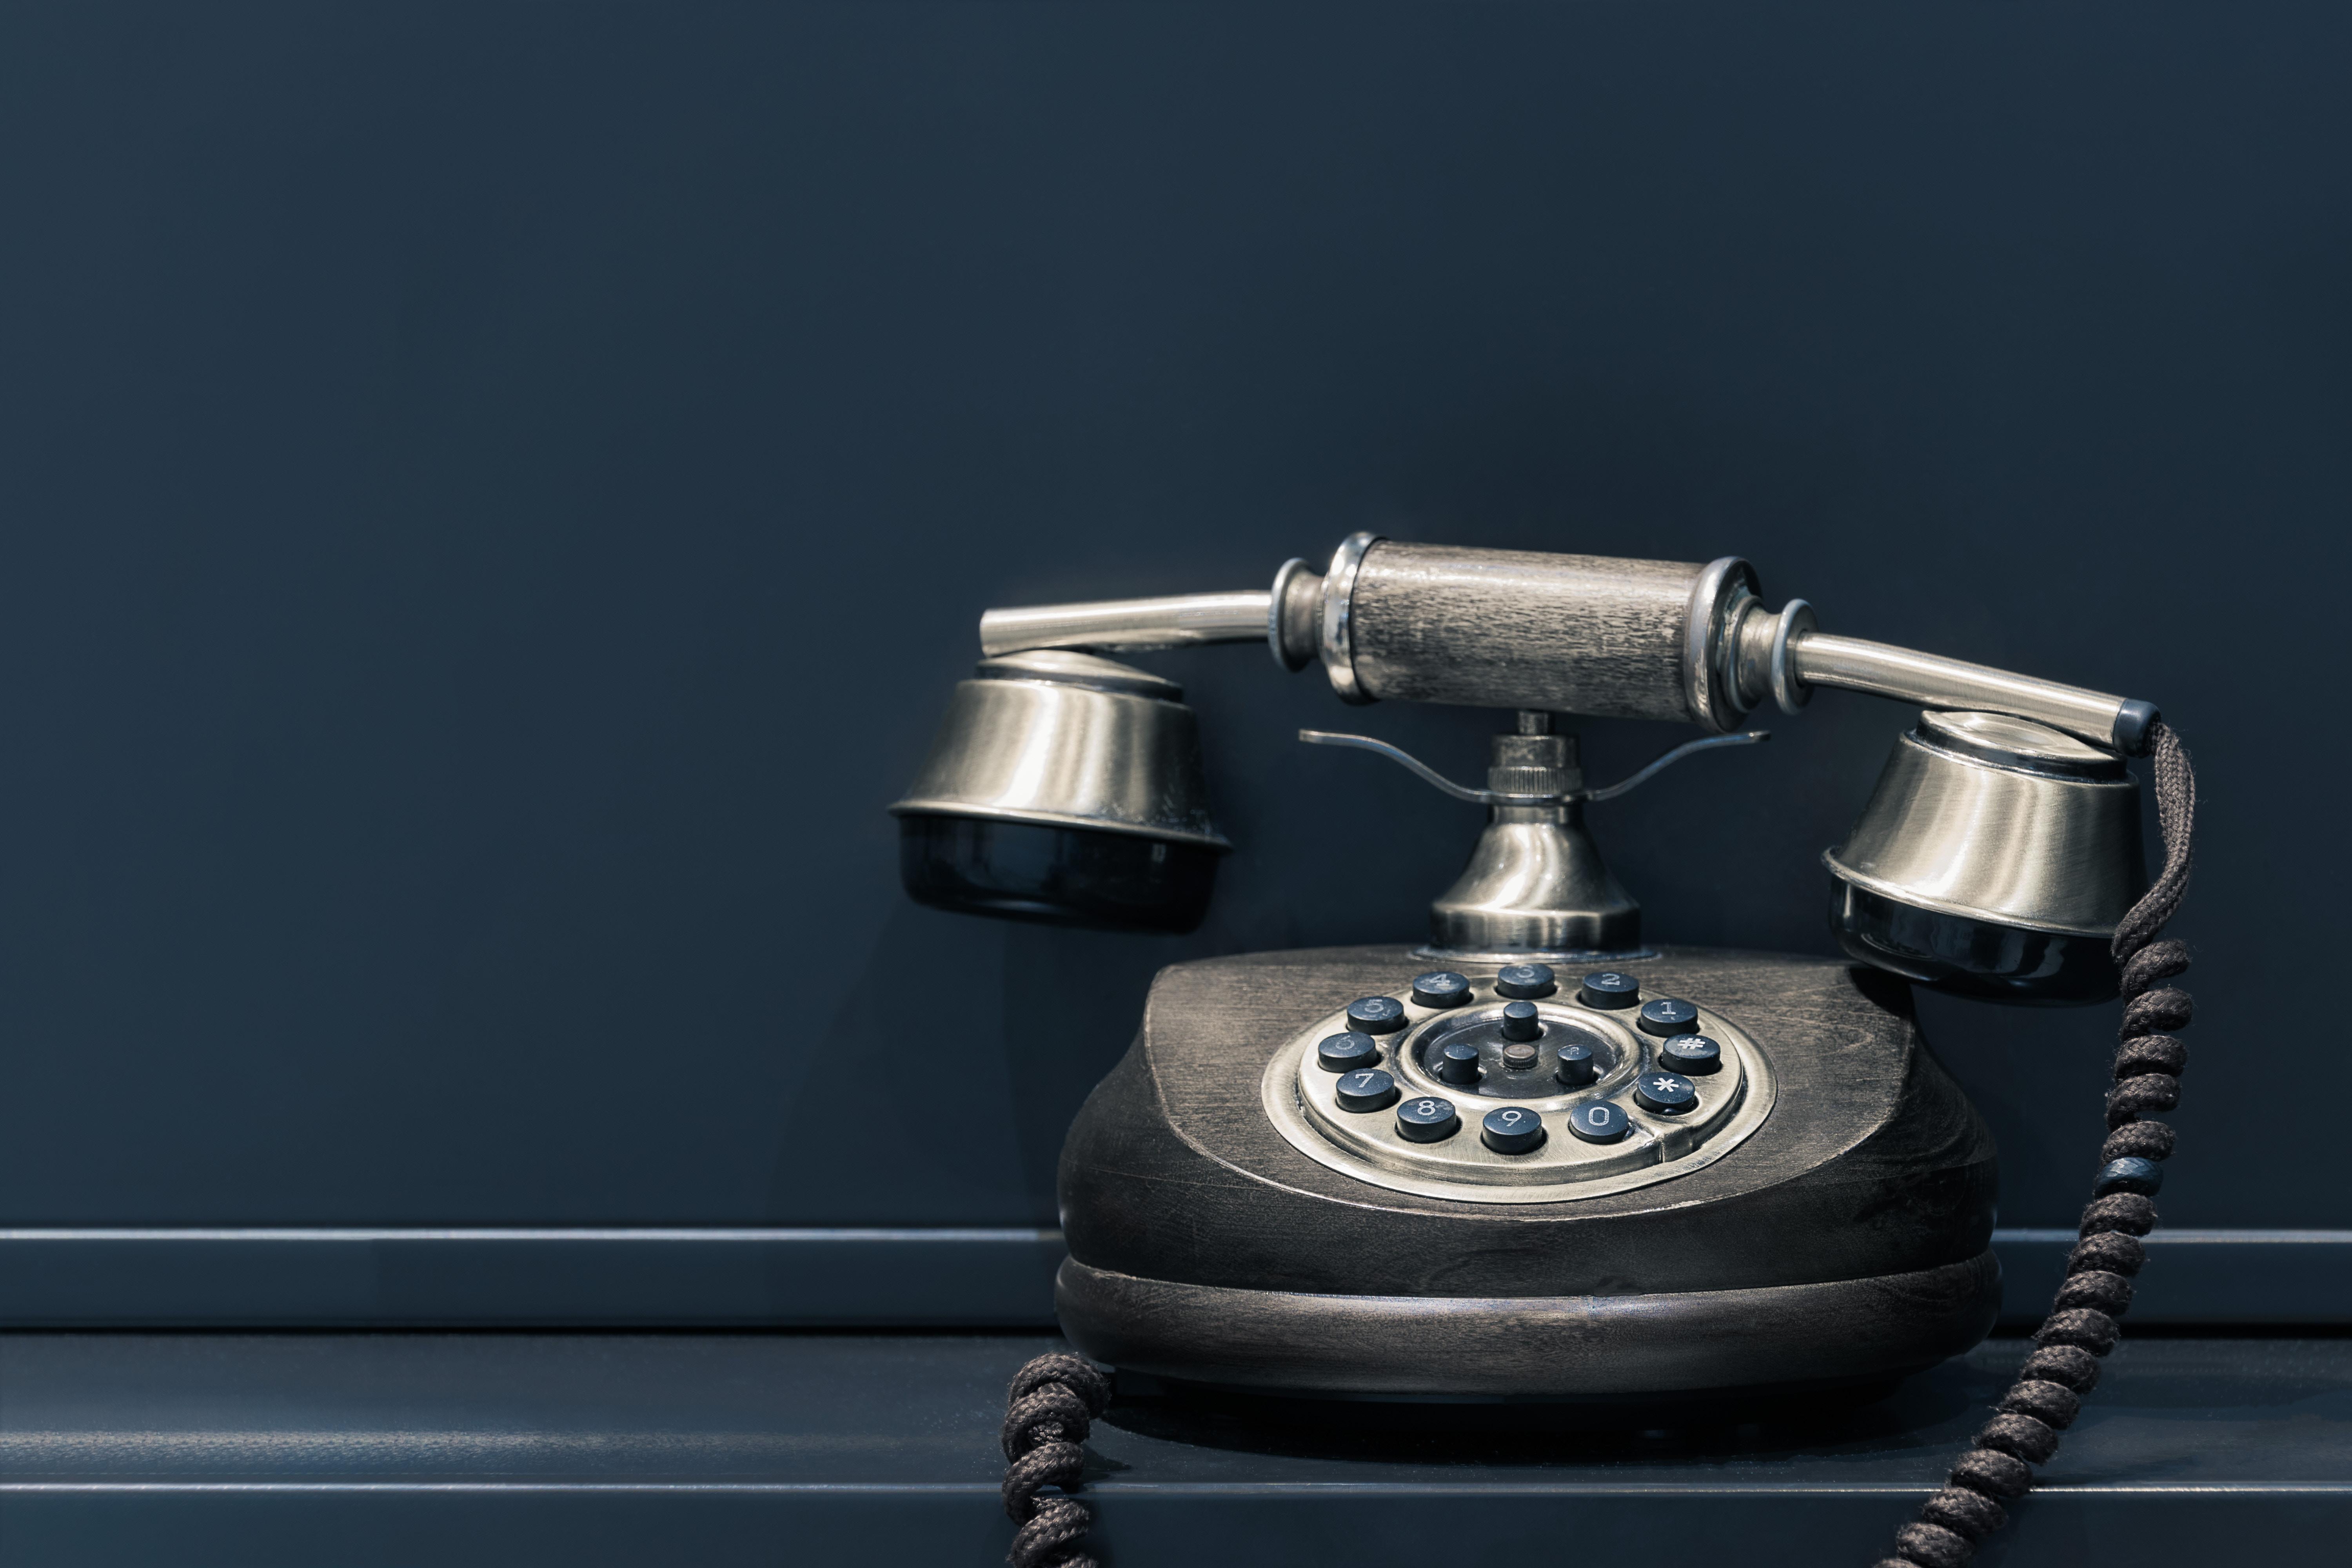 Telefonische Kurz-Beratung